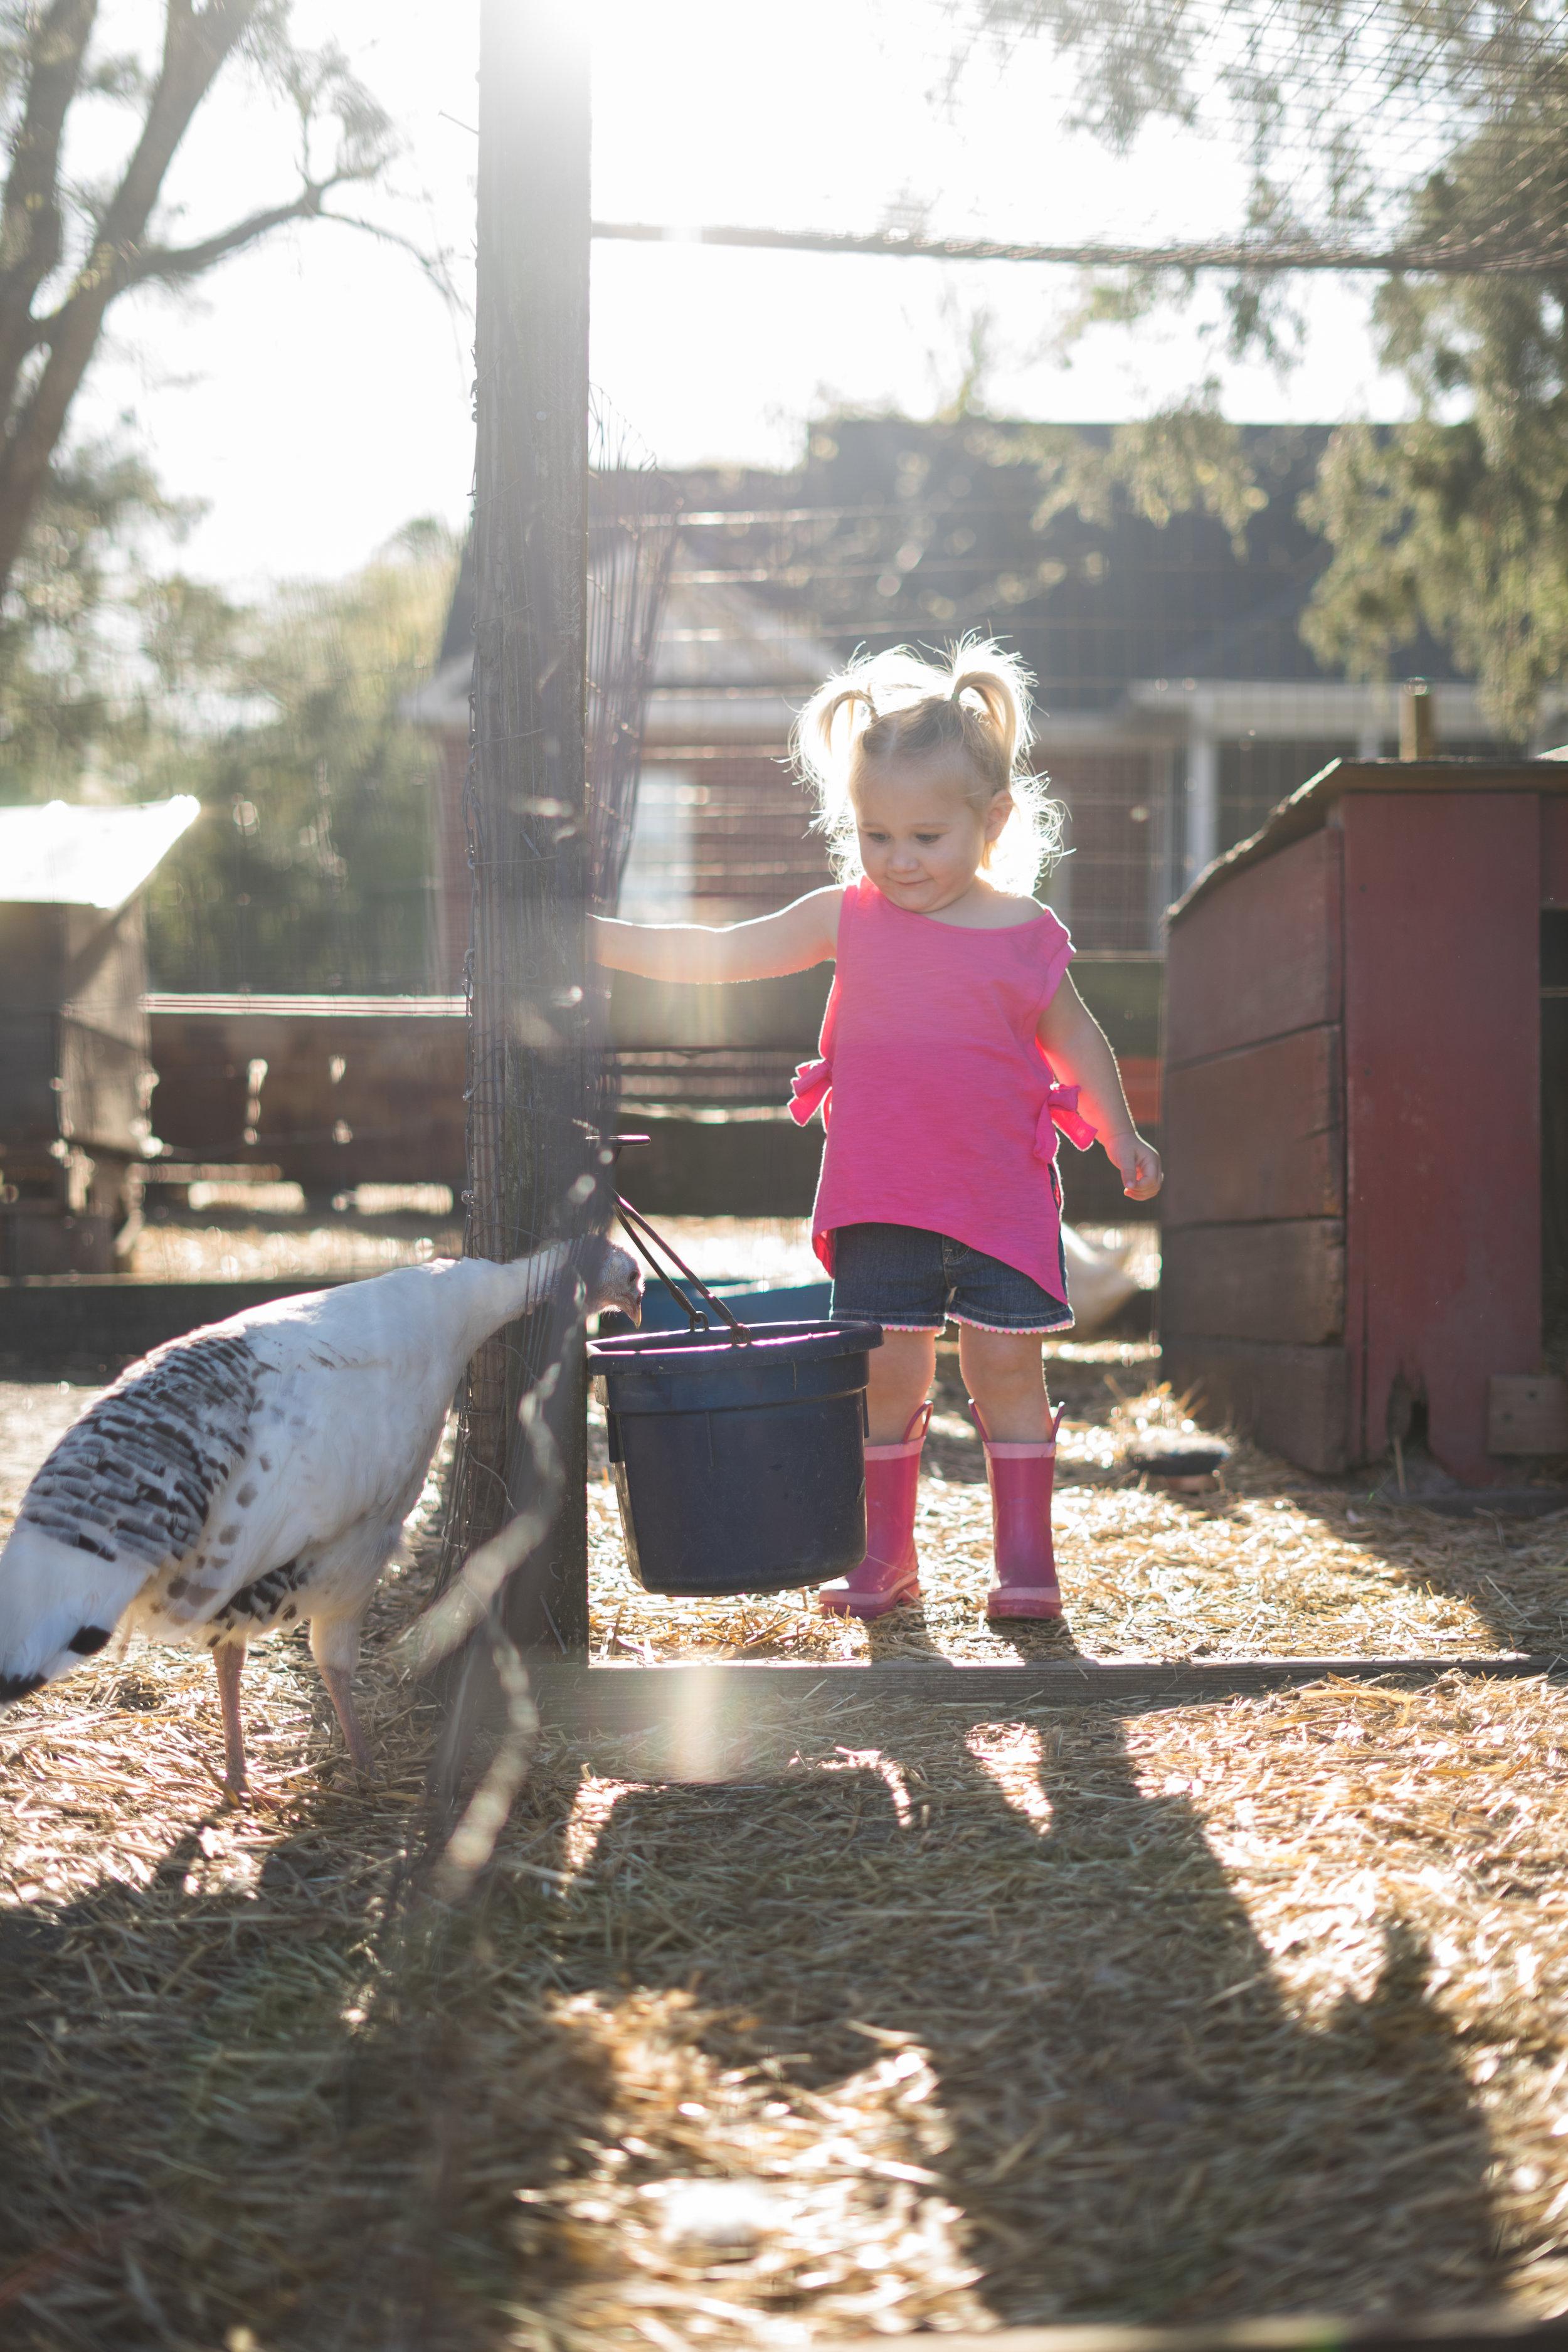 Lifestyle Session At Old Mcfaye S Farm Virginia Gates Photography Wilmington Nc Photographer 910 233 8227